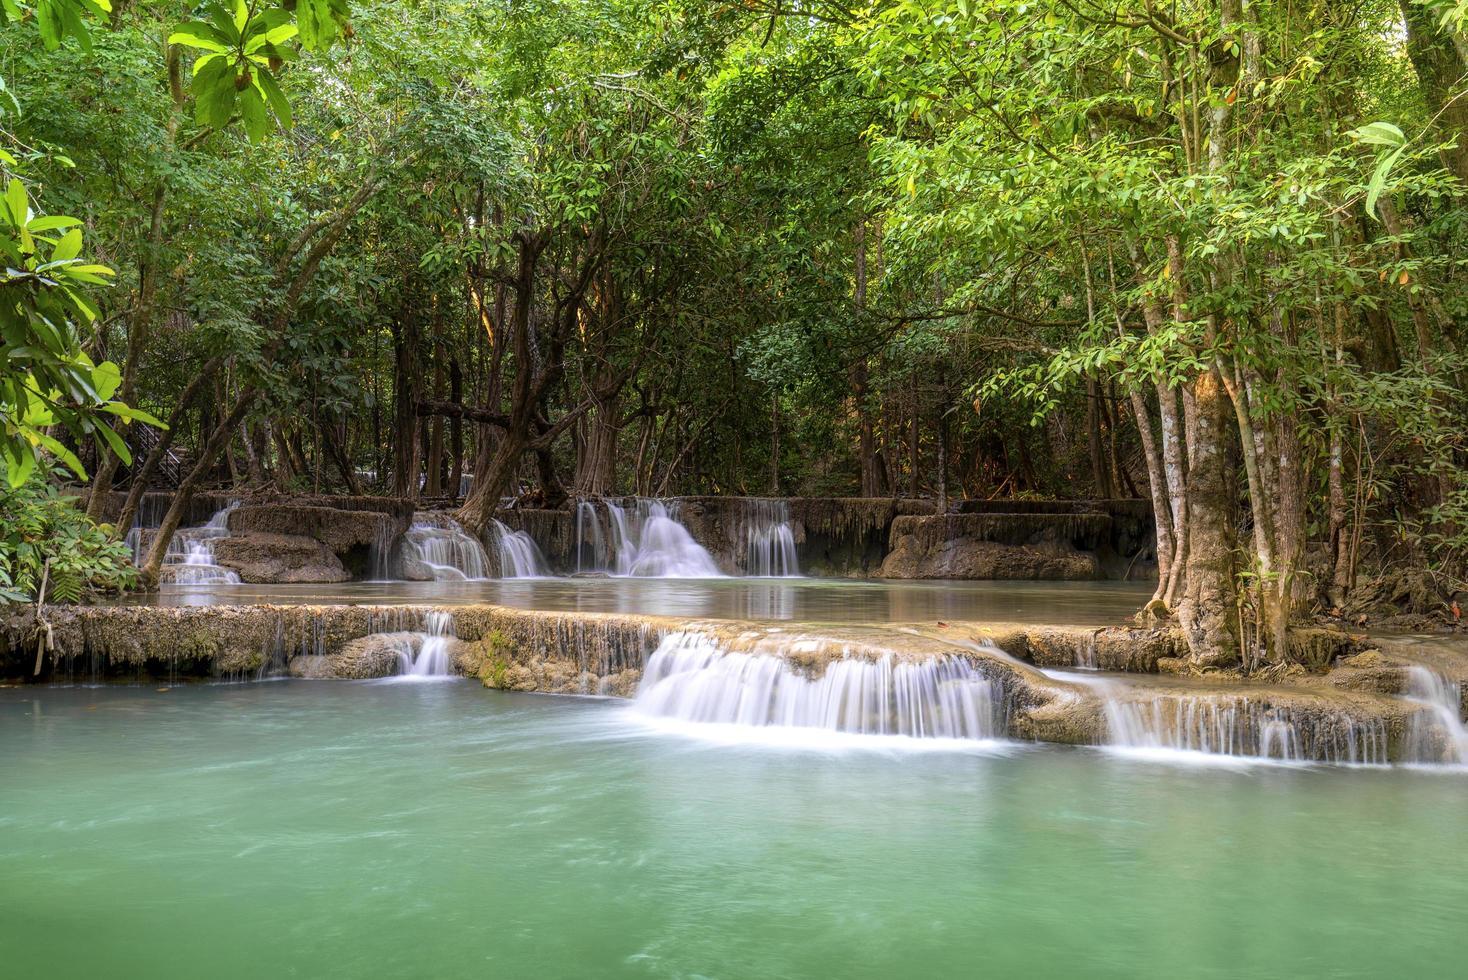 Cascade dans le parc national de khuean srinagarindra photo